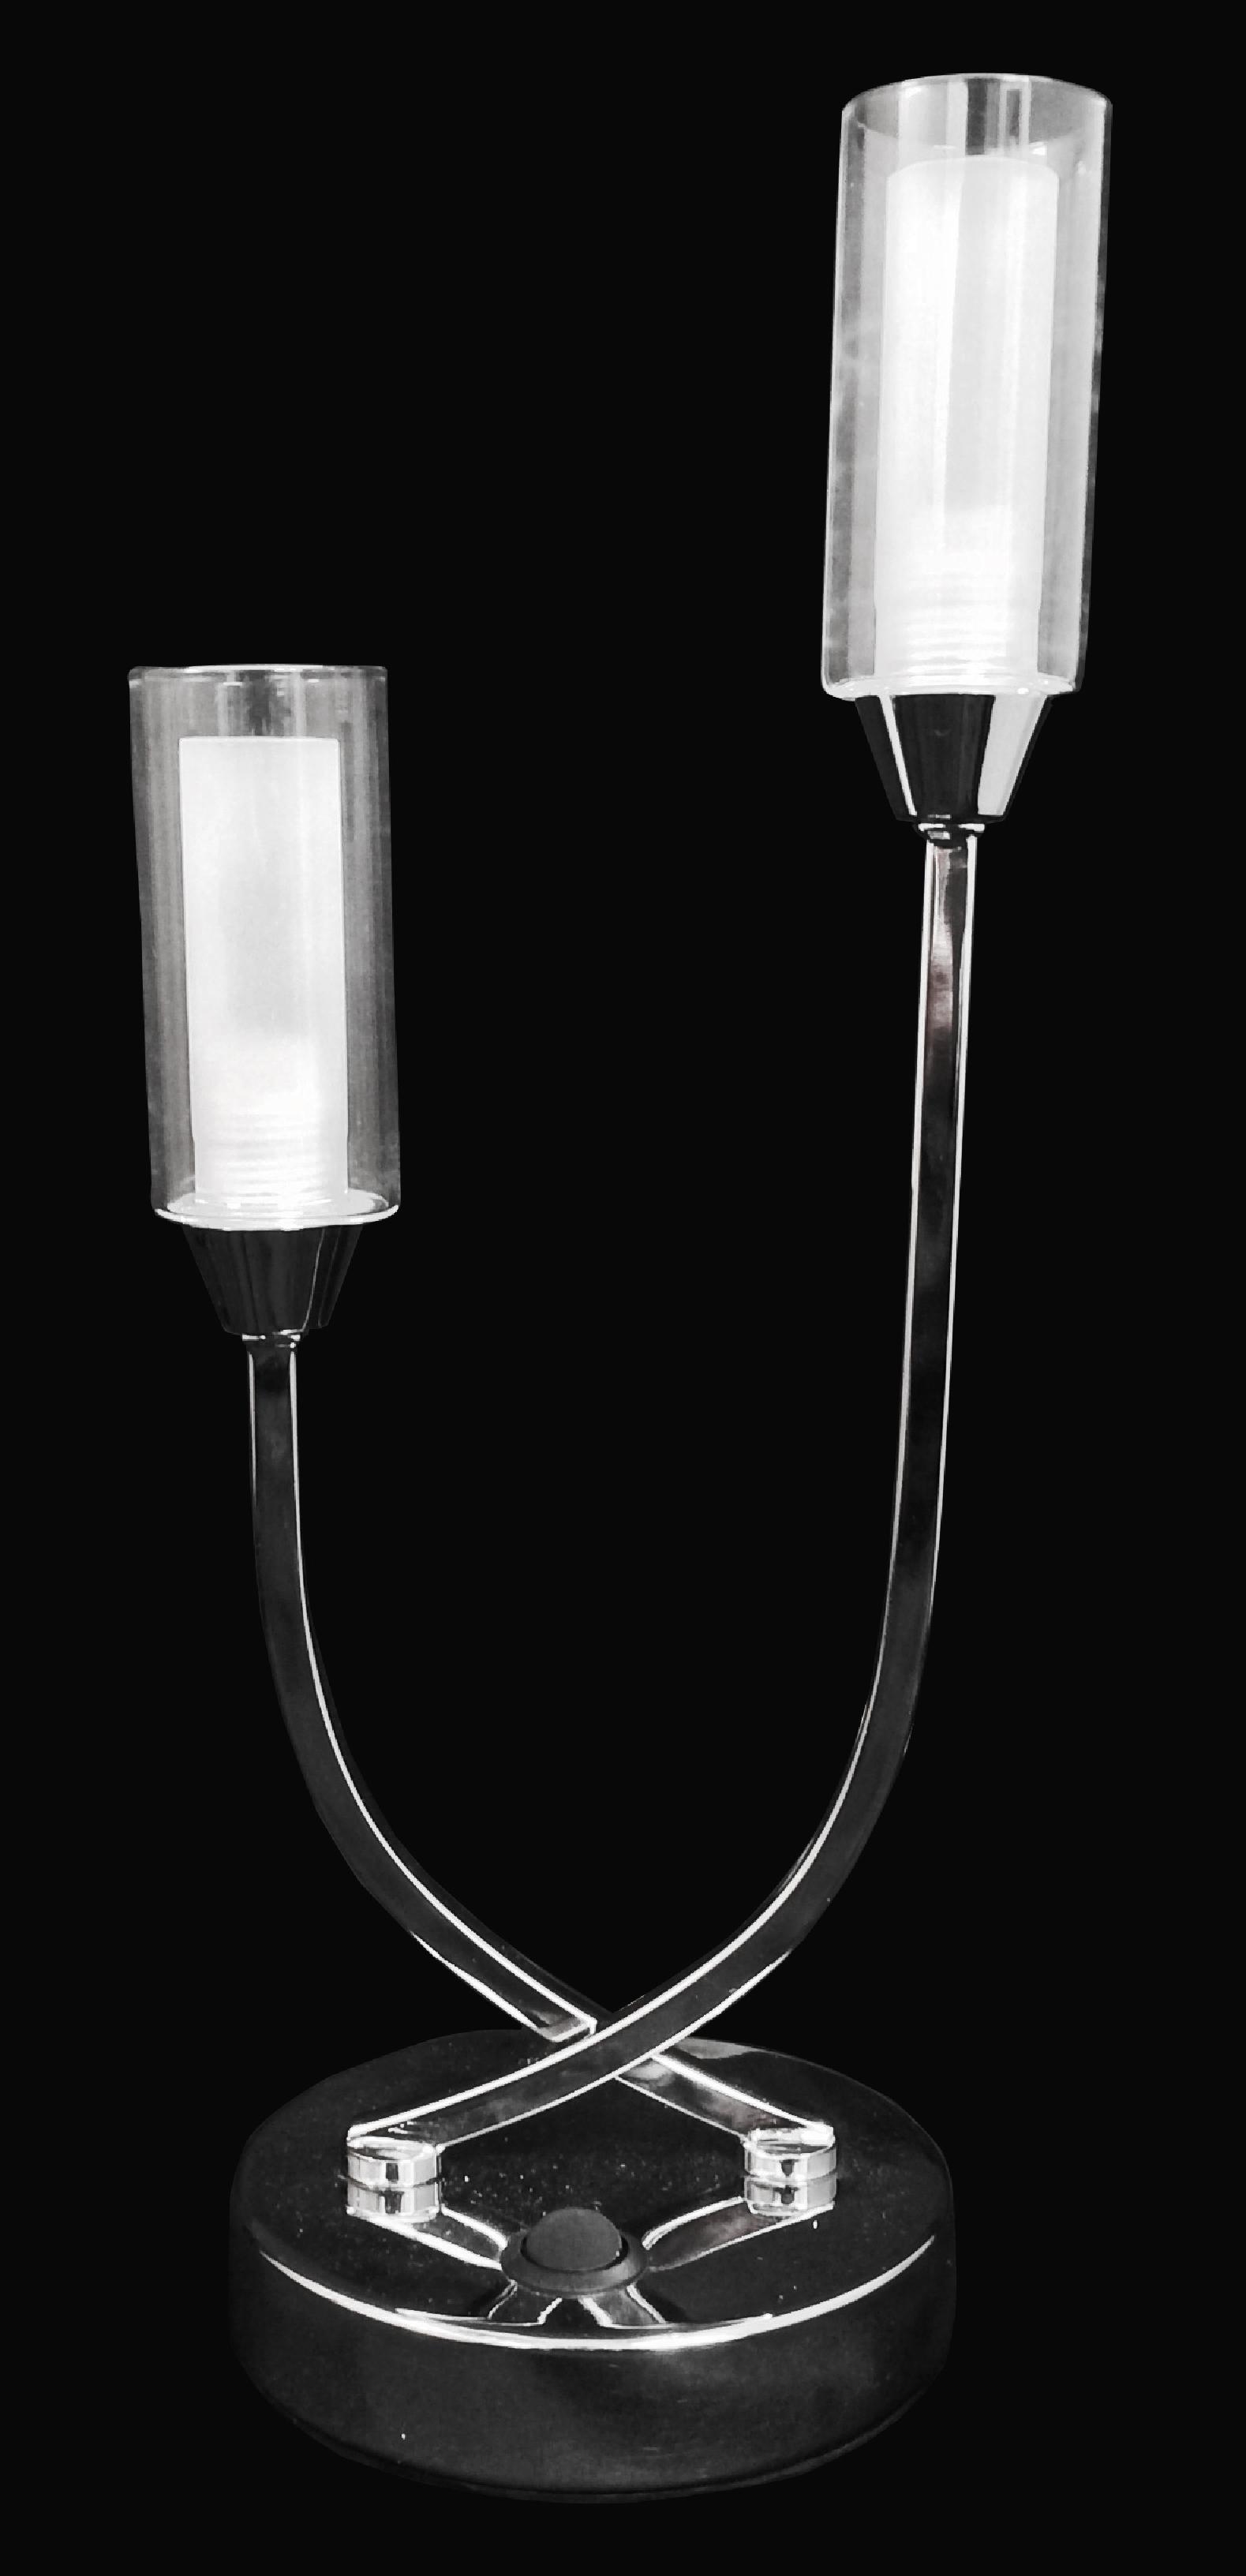 Canarina table lamp satin nickel lumination lighting canarina table lamp satin nickel mozeypictures Image collections